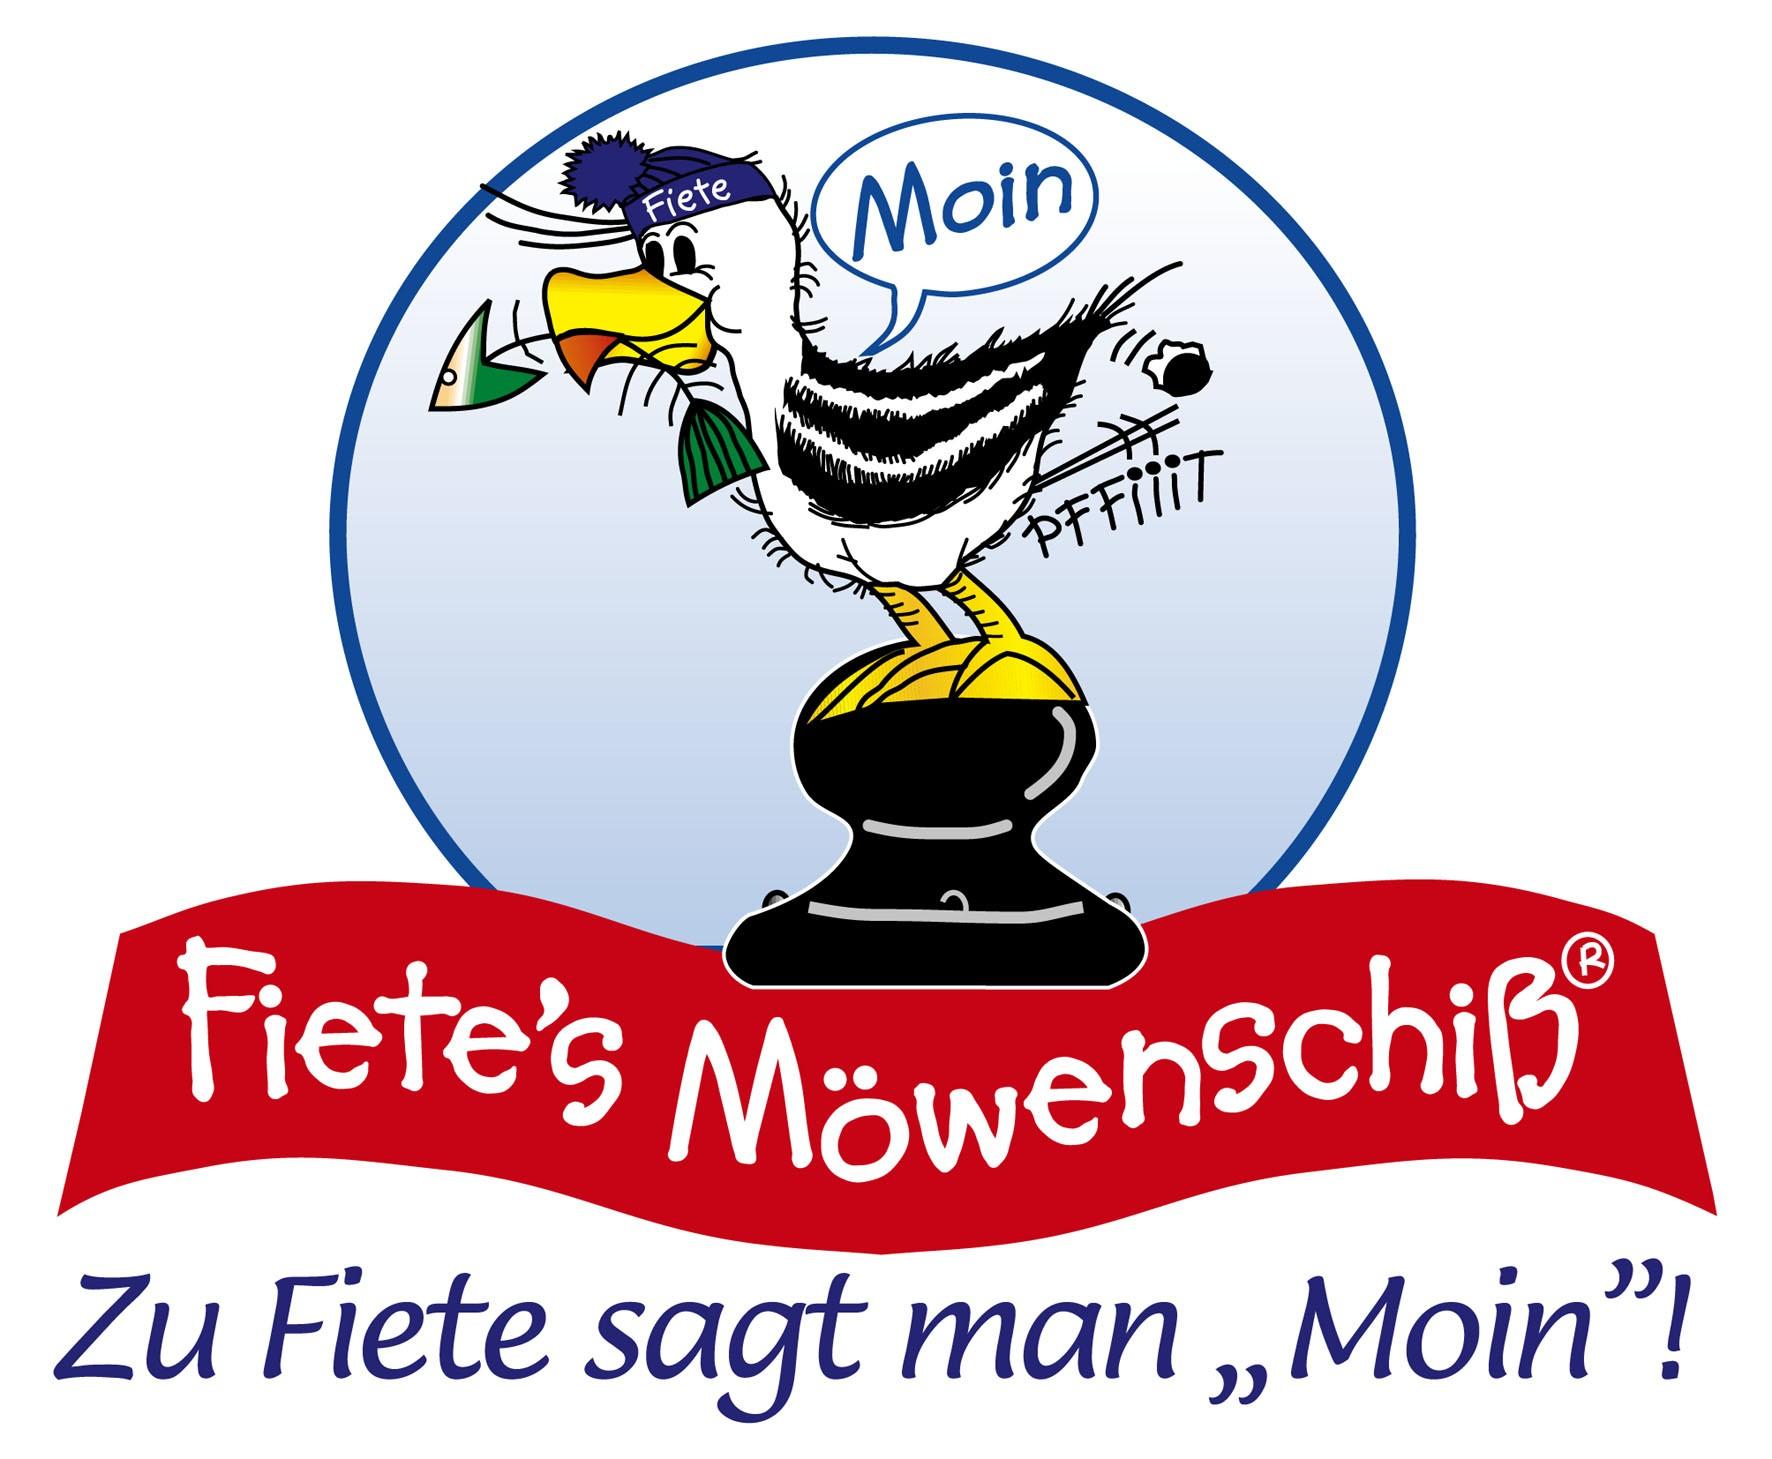 Fiete's Möwenschiss